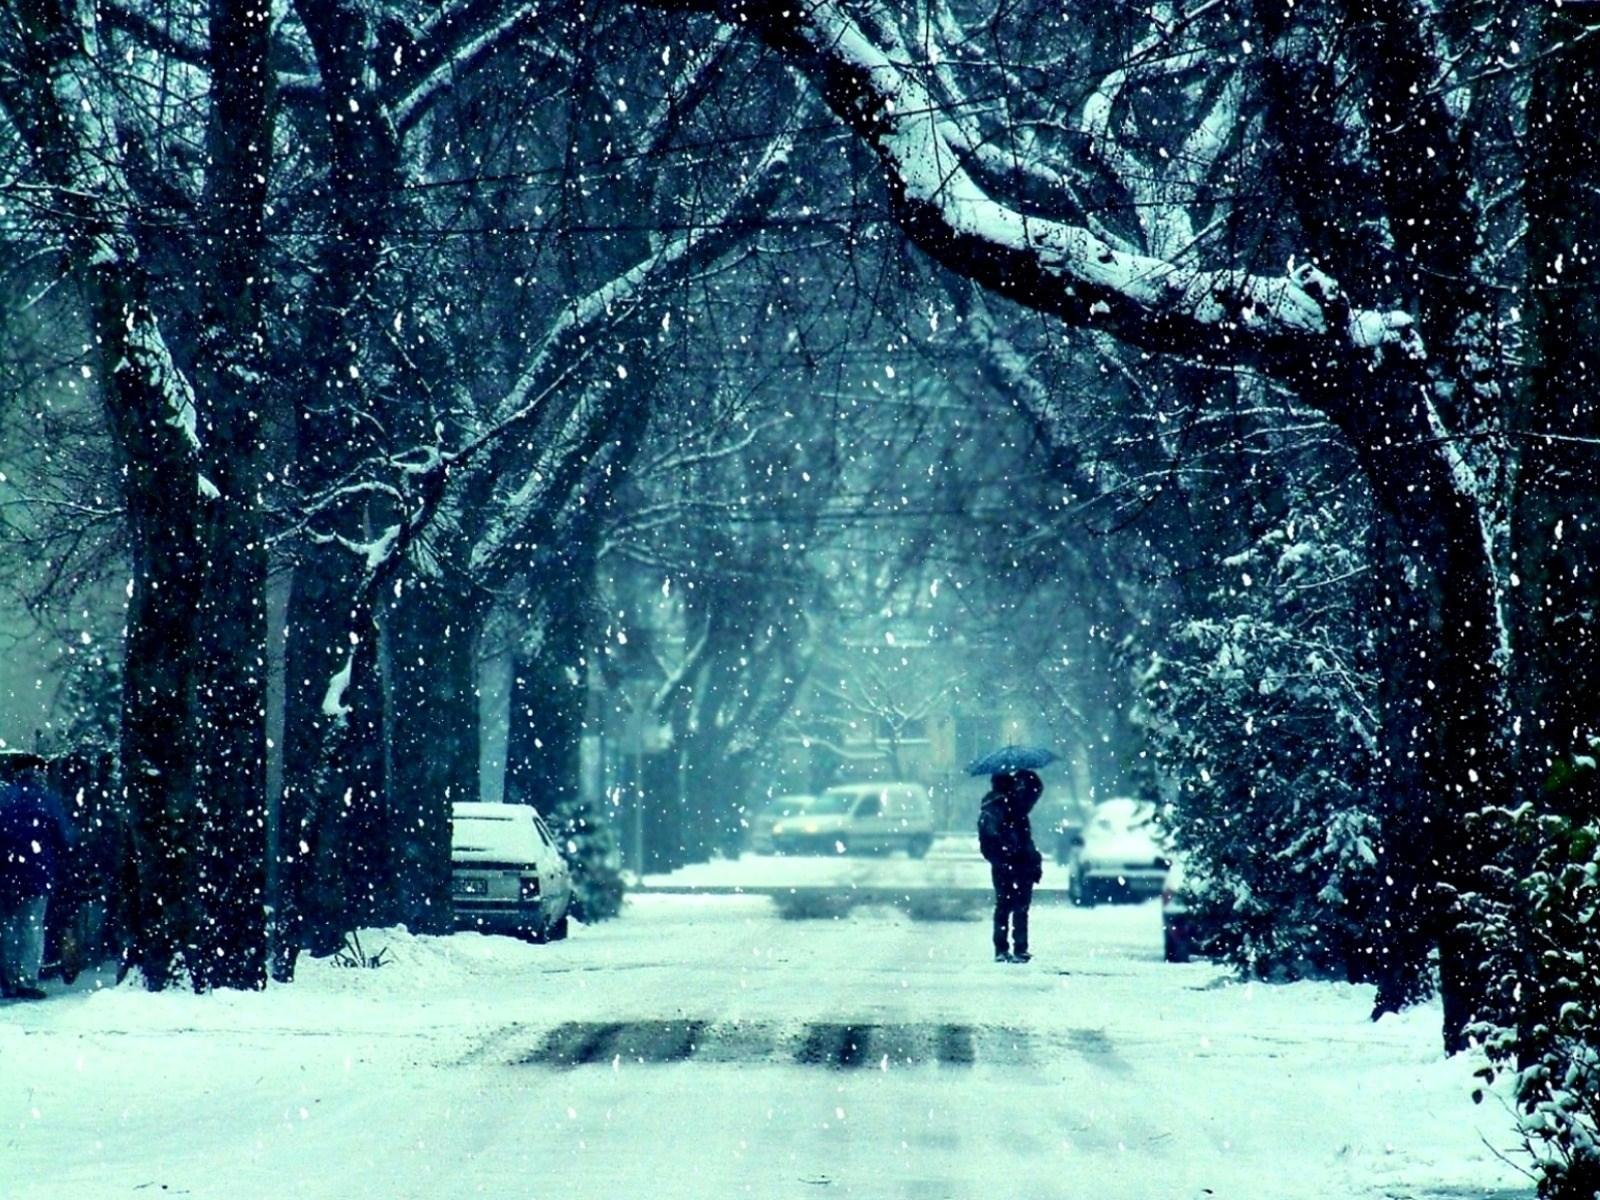 Winter Frost Snow Road Trees HD Wallpaper 1600x1200